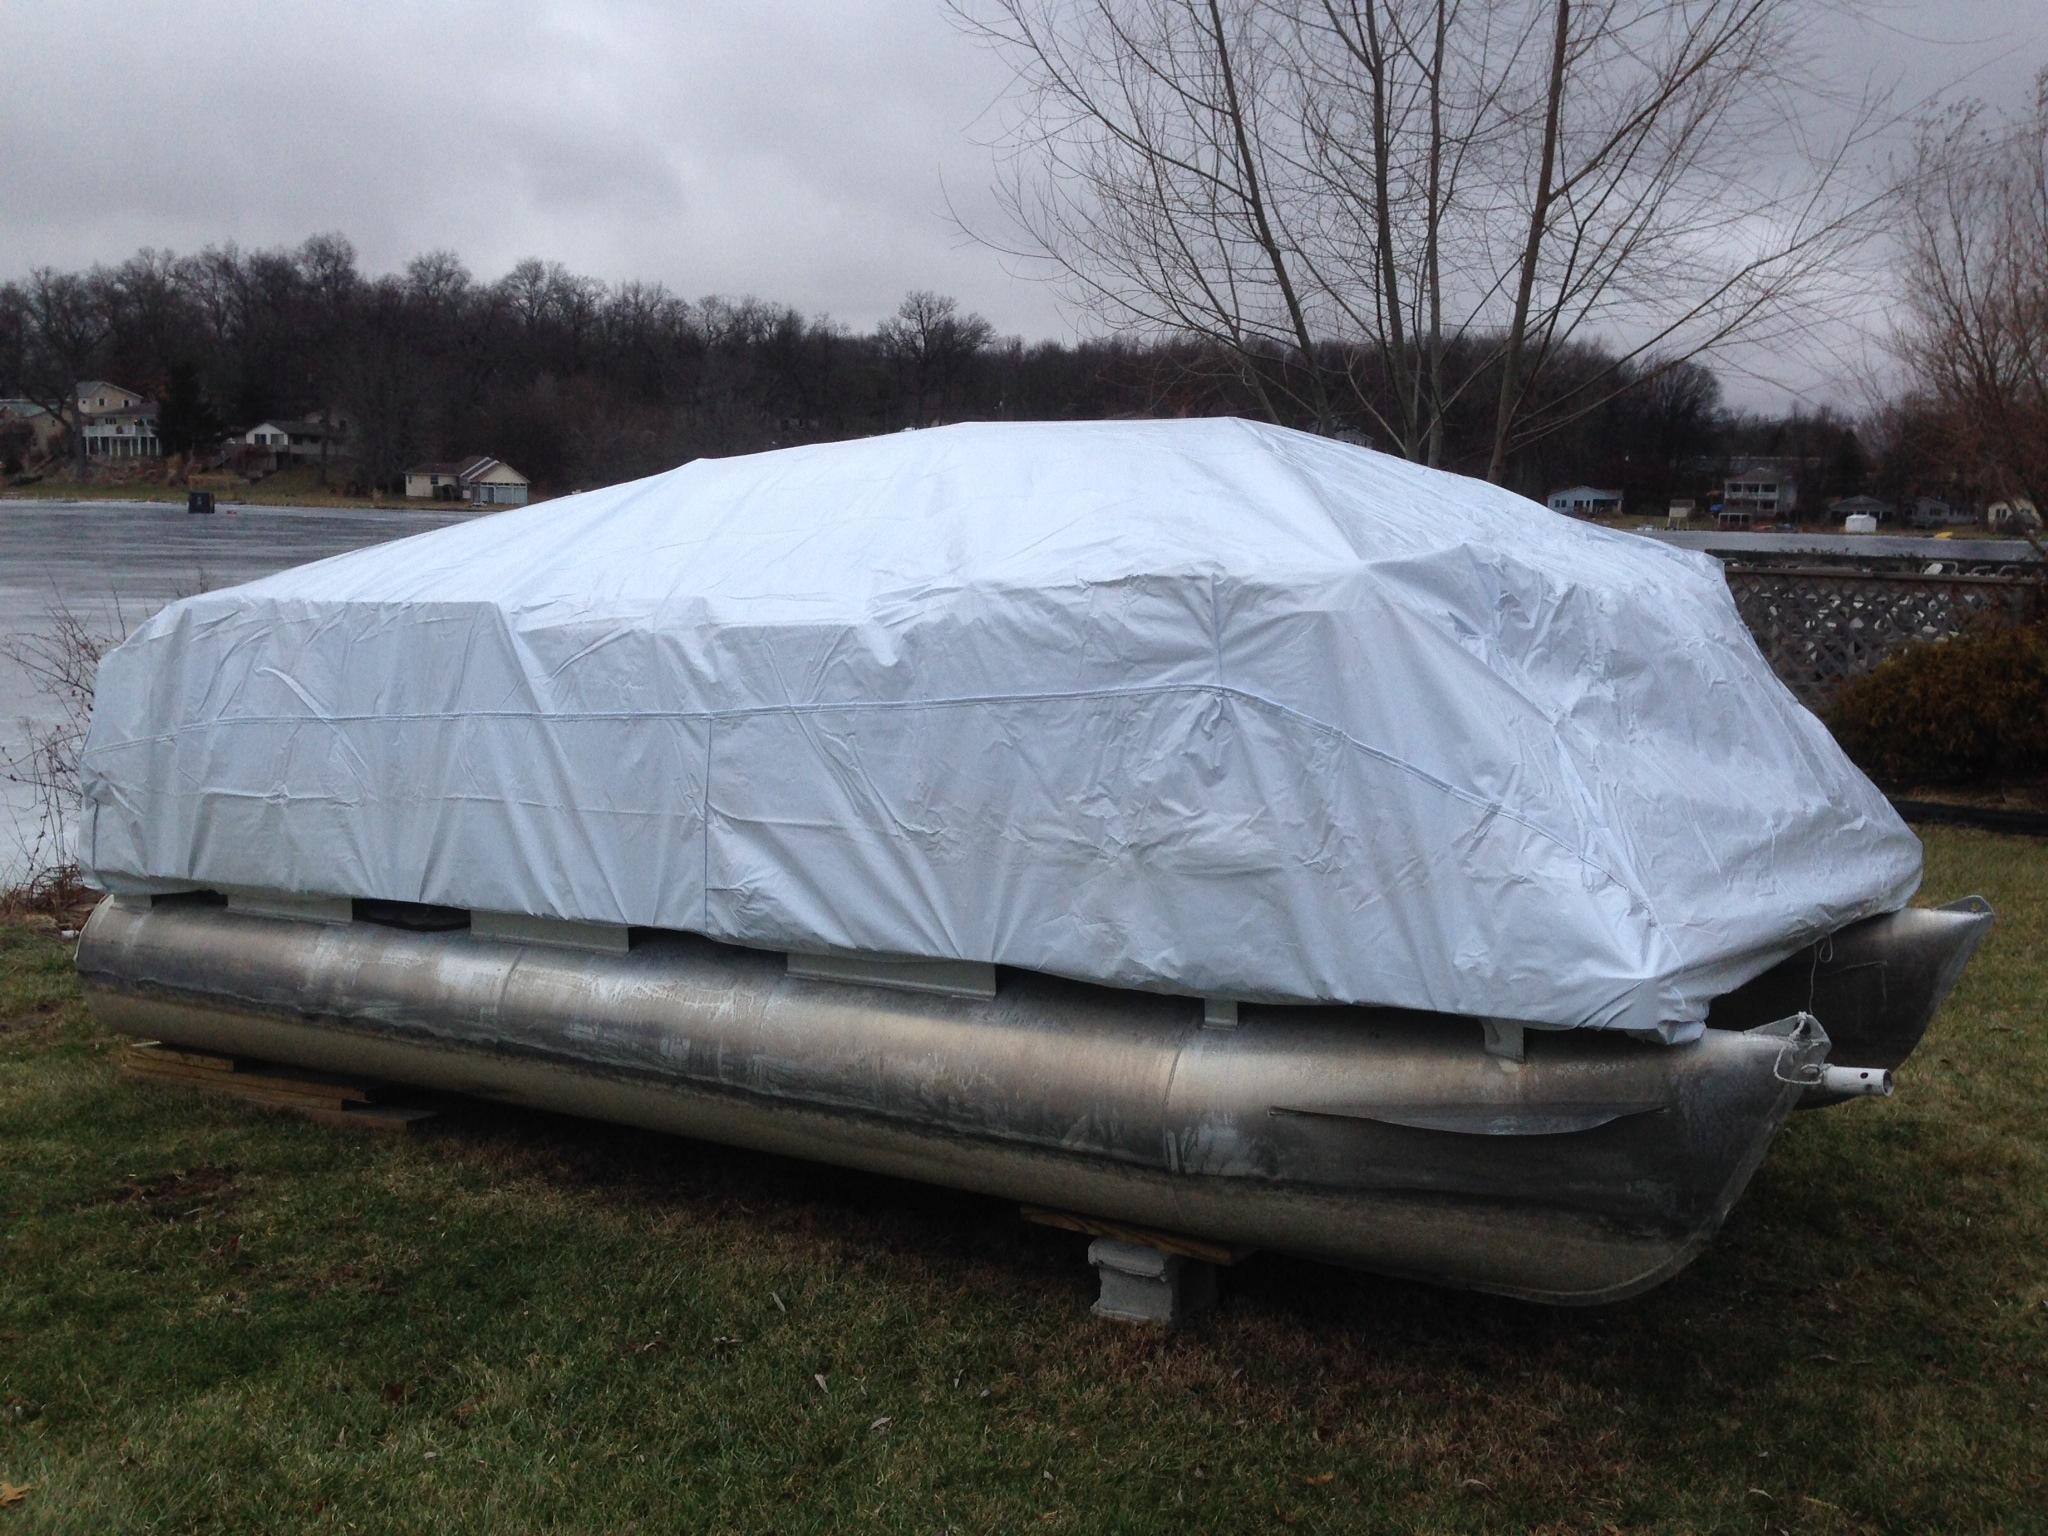 Transhield 24 Ft Pontoon Reusable Boat Cover For 4 Ft